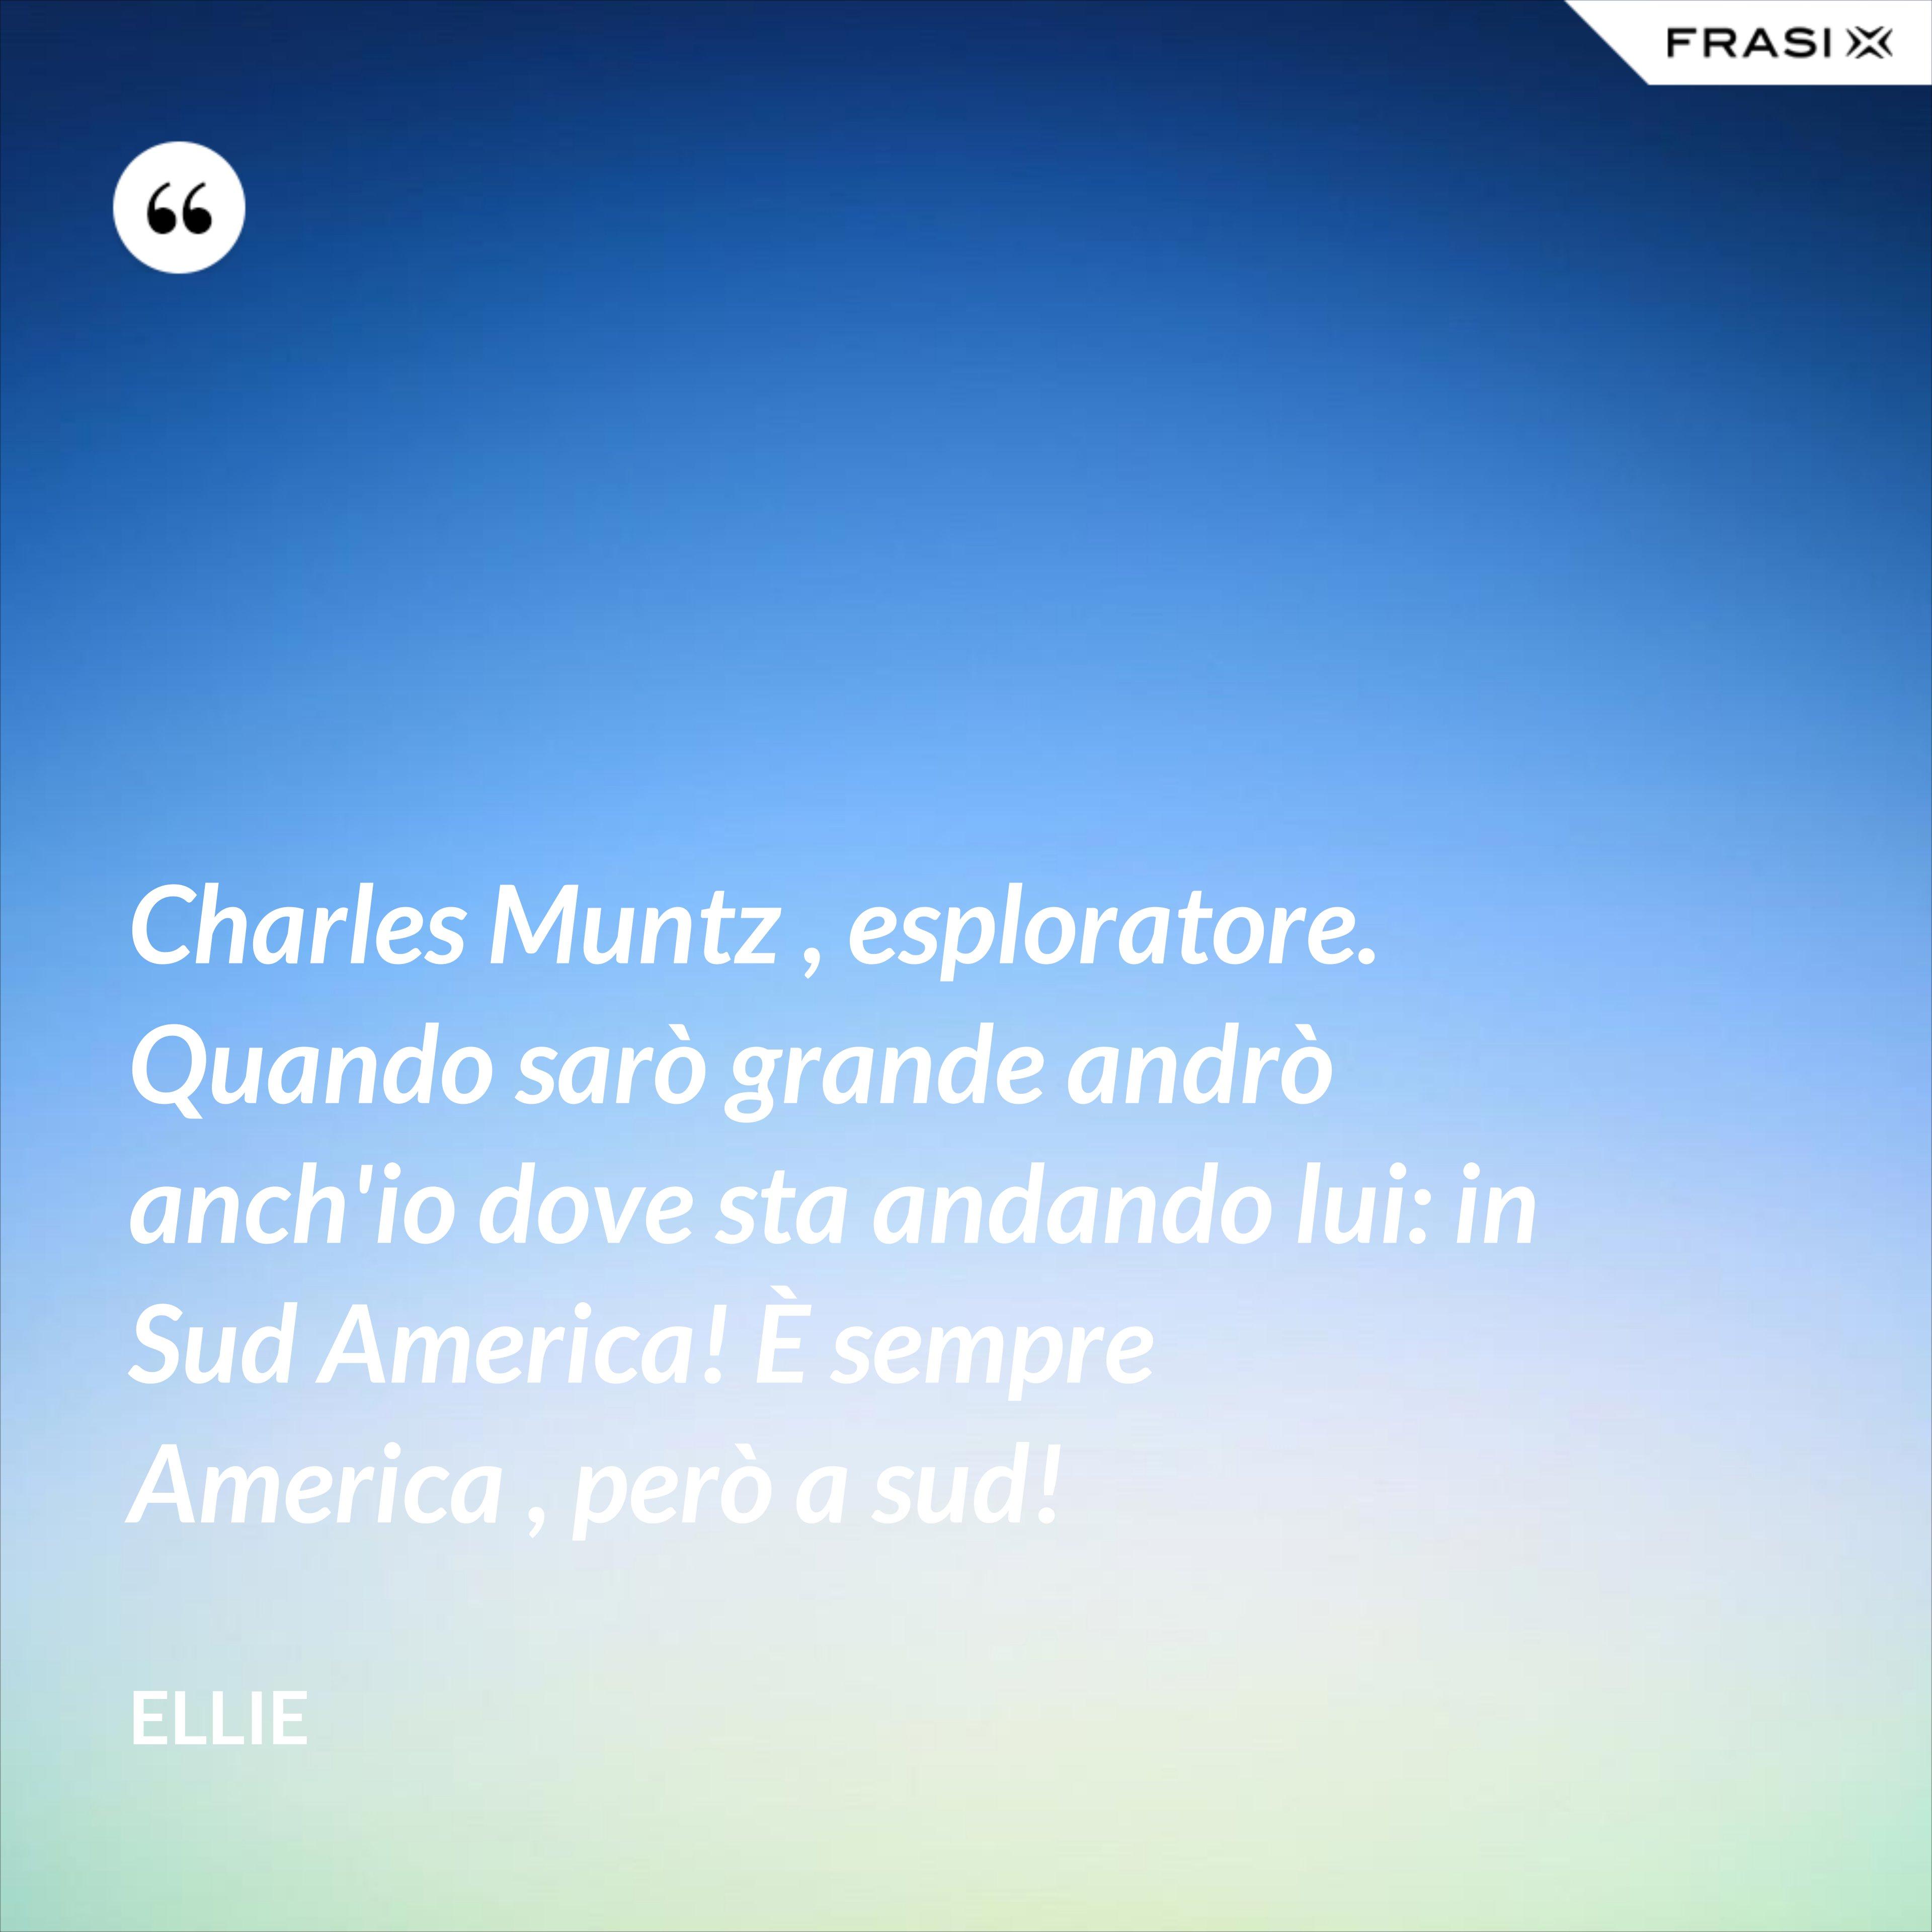 Charles Muntz , esploratore. Quando sarò grande andrò anch'io dove sta andando lui: in Sud America! È sempre America , però a sud! - Ellie